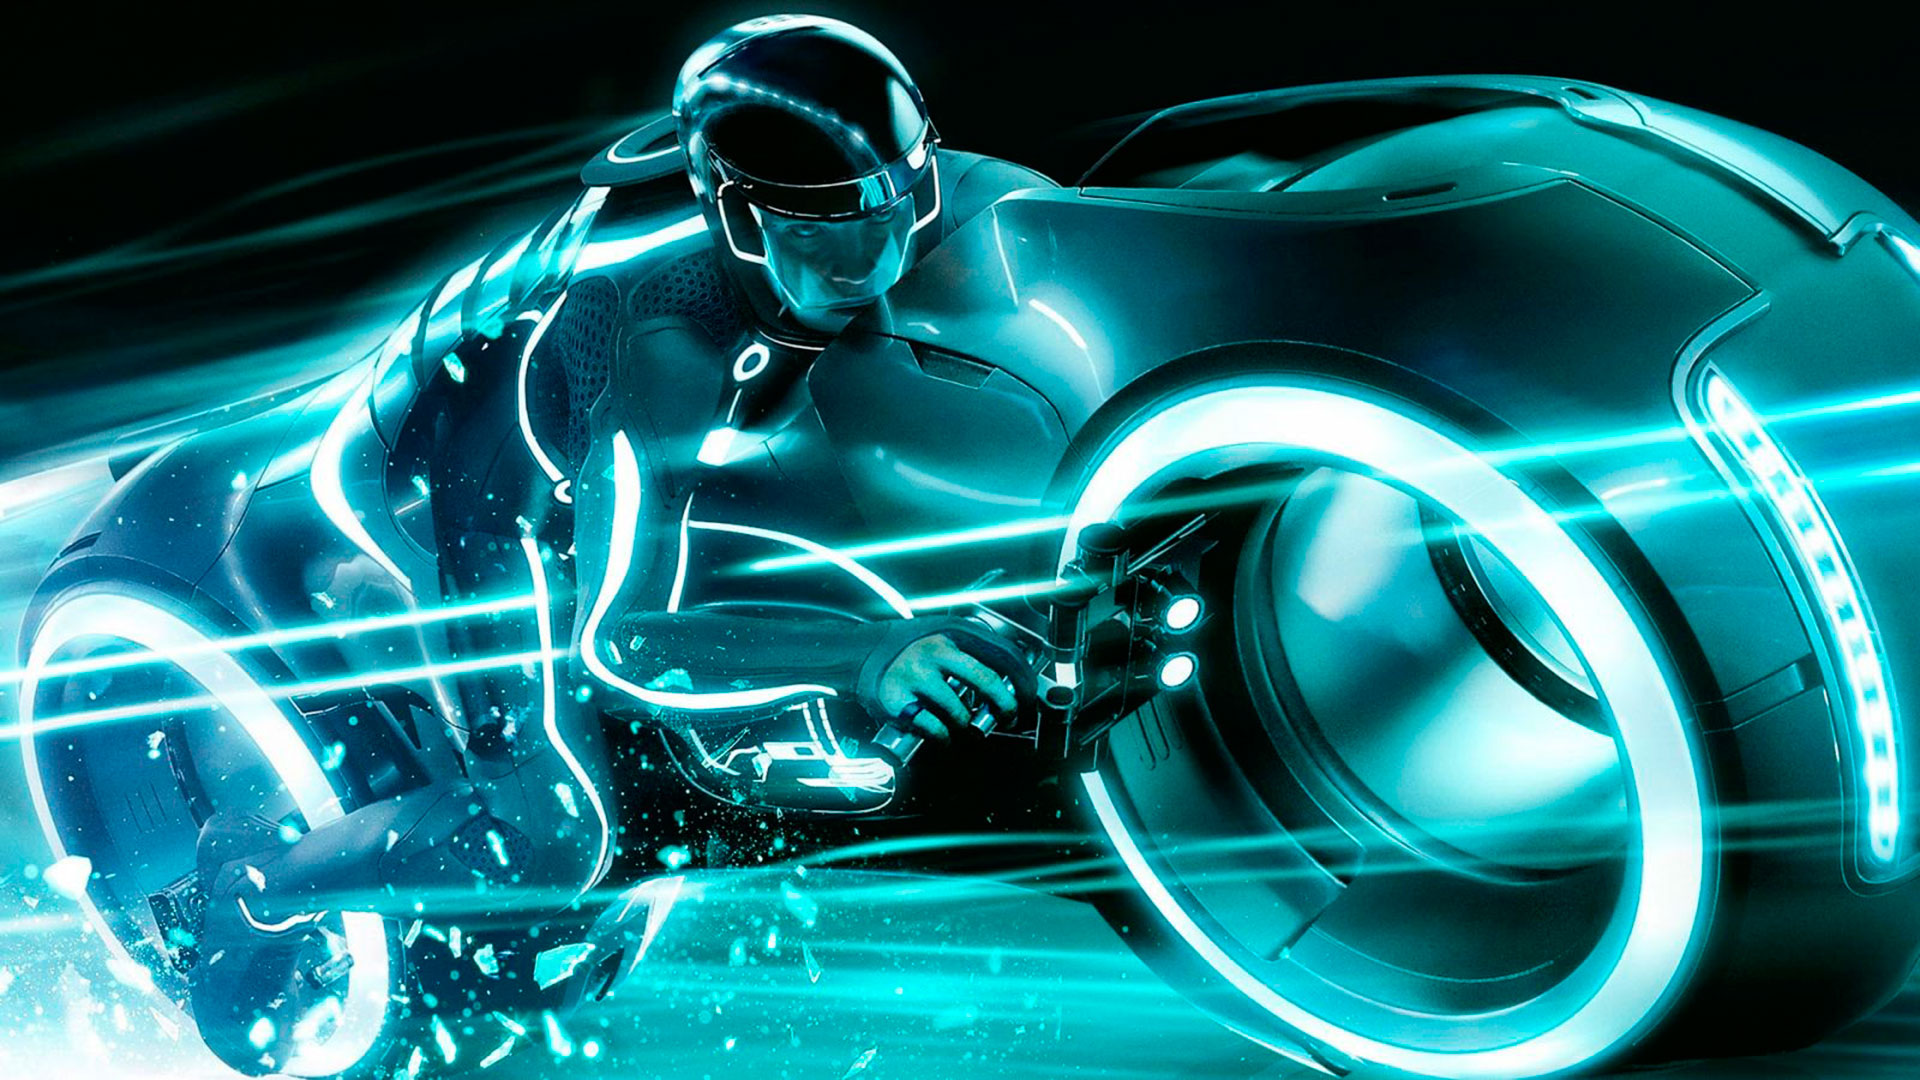 motorrad fantasie hintergrundbilder hd